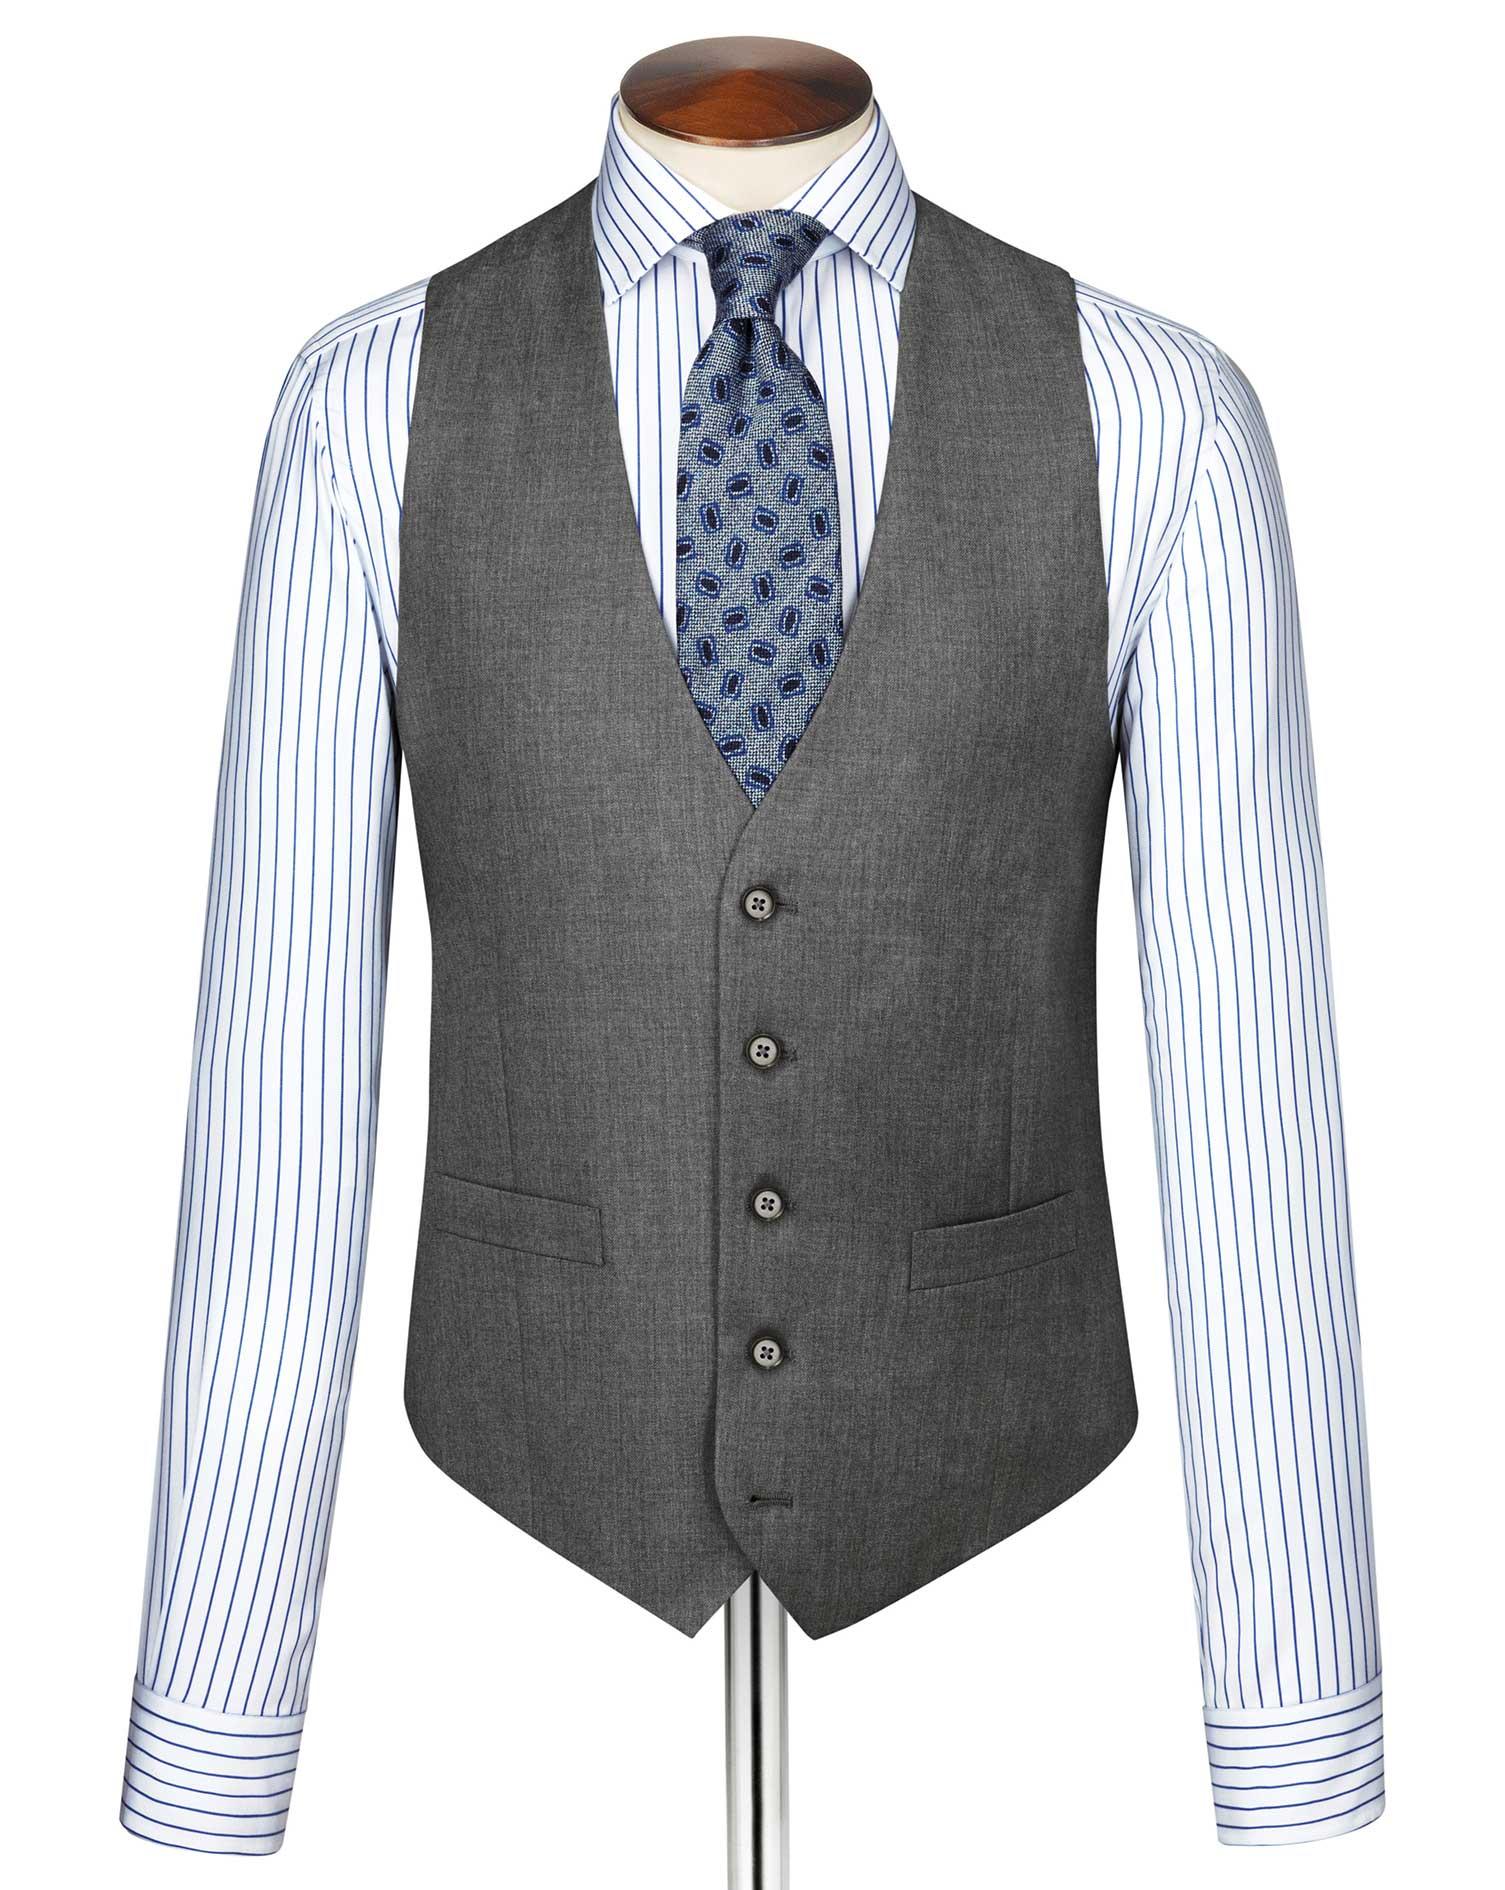 Mid Grey Twill Business Suit Wool Waistcoat Size w42 by Charles Tyrwhitt